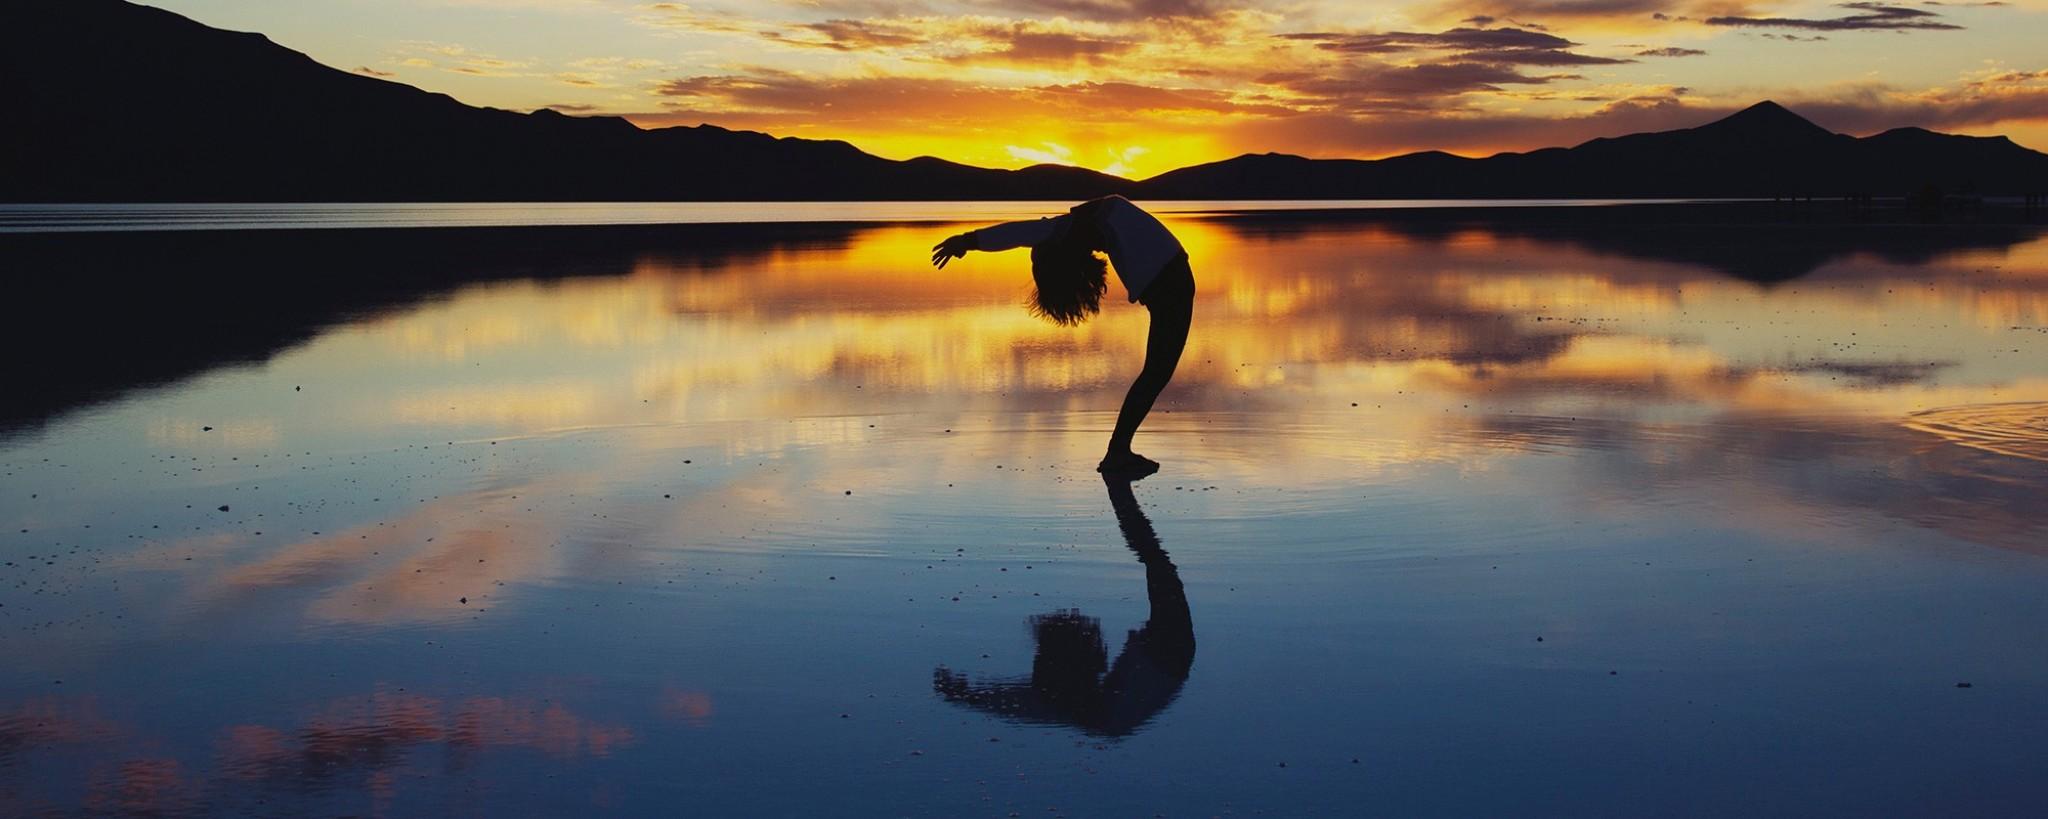 Should You Take a Wellness Sabbatical in 2020?